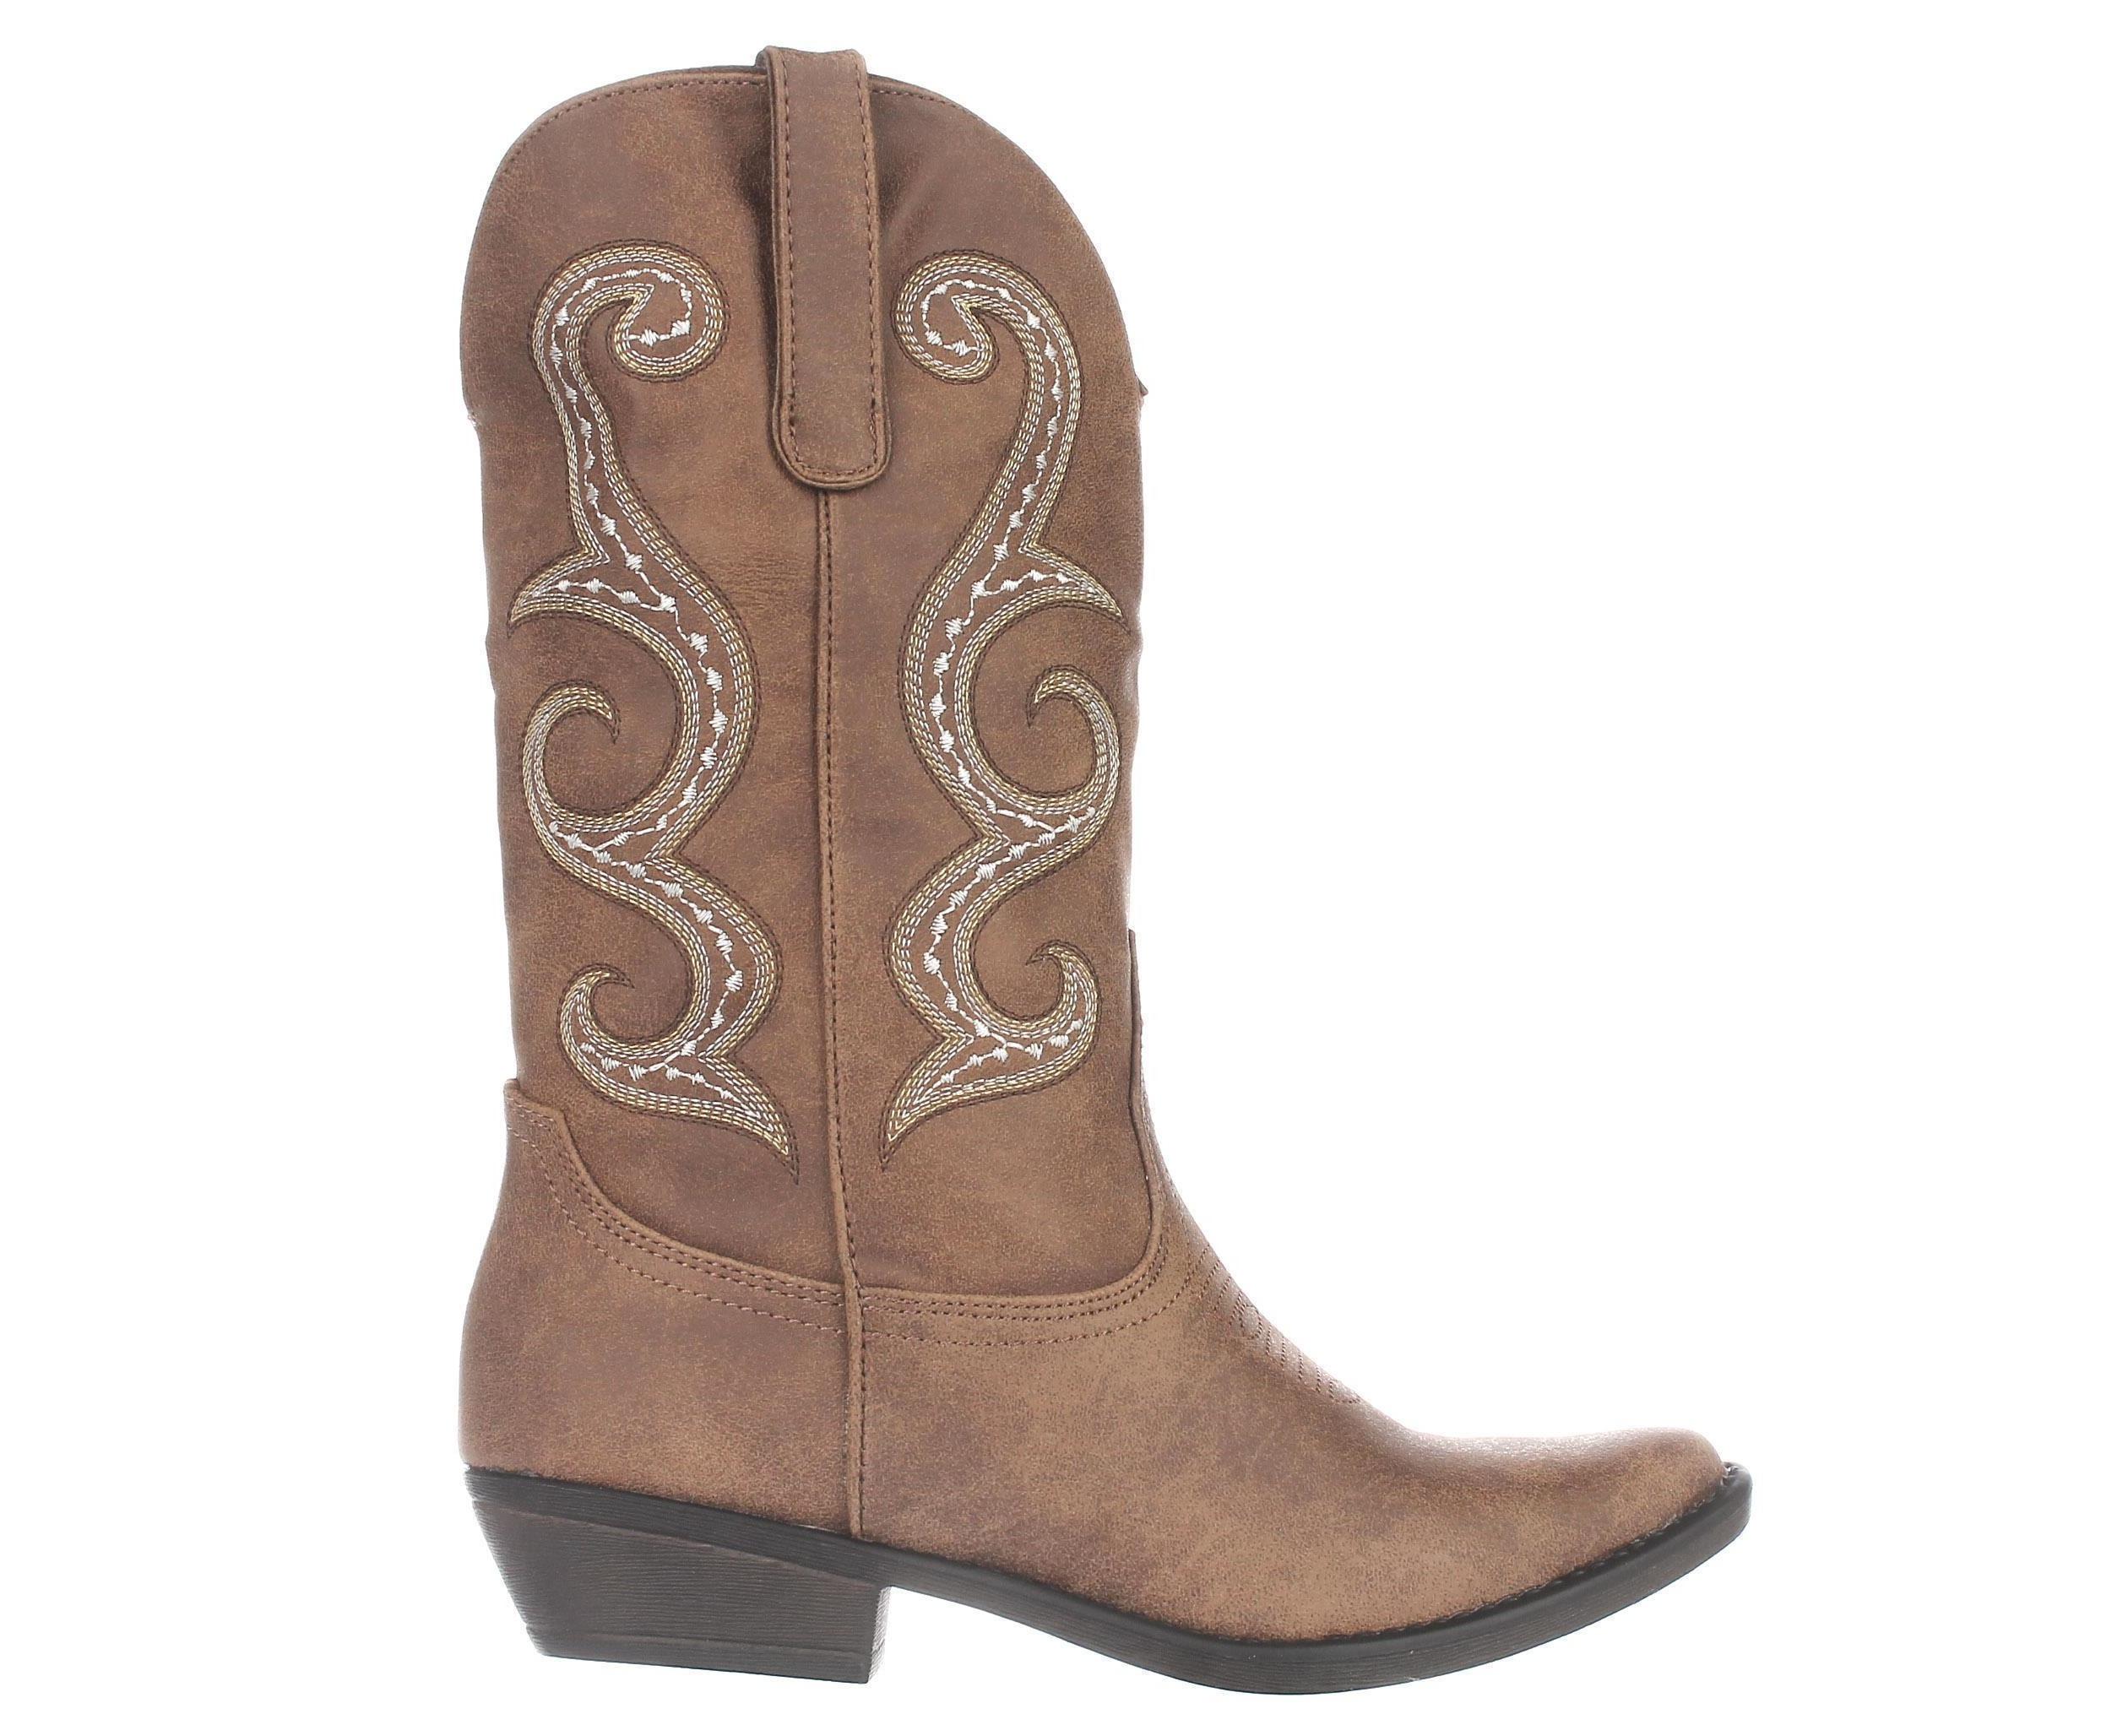 50a2ede8f82 AR35 Dawnn Cowgirl Western Boots, Natural